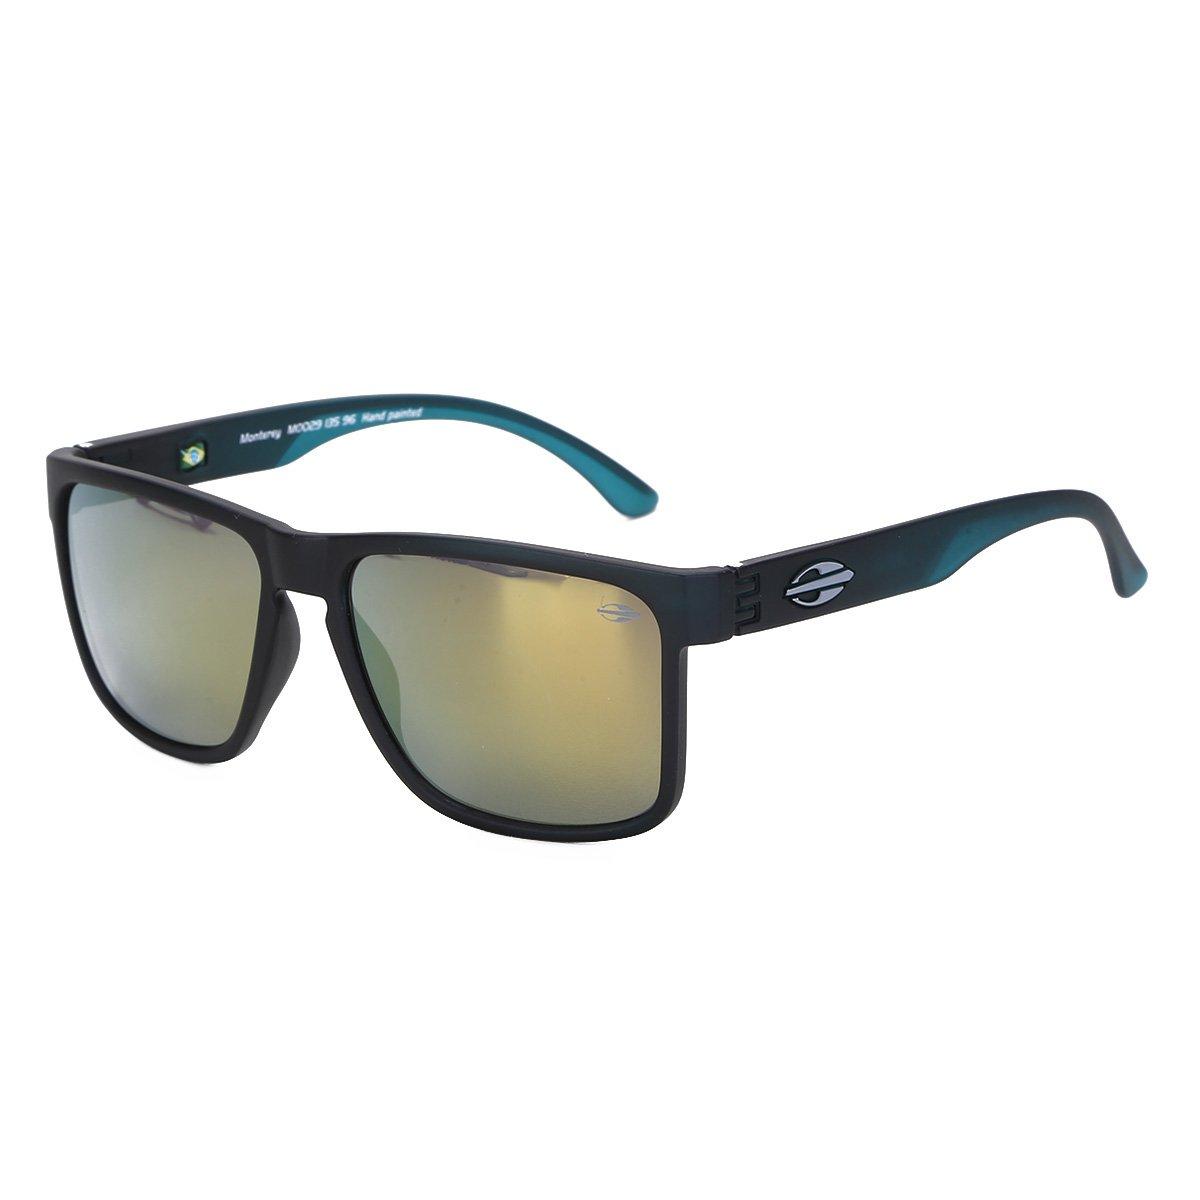 b7cbbc978 Óculos de Sol Mormaii Monterey M0029I3596 Masculino